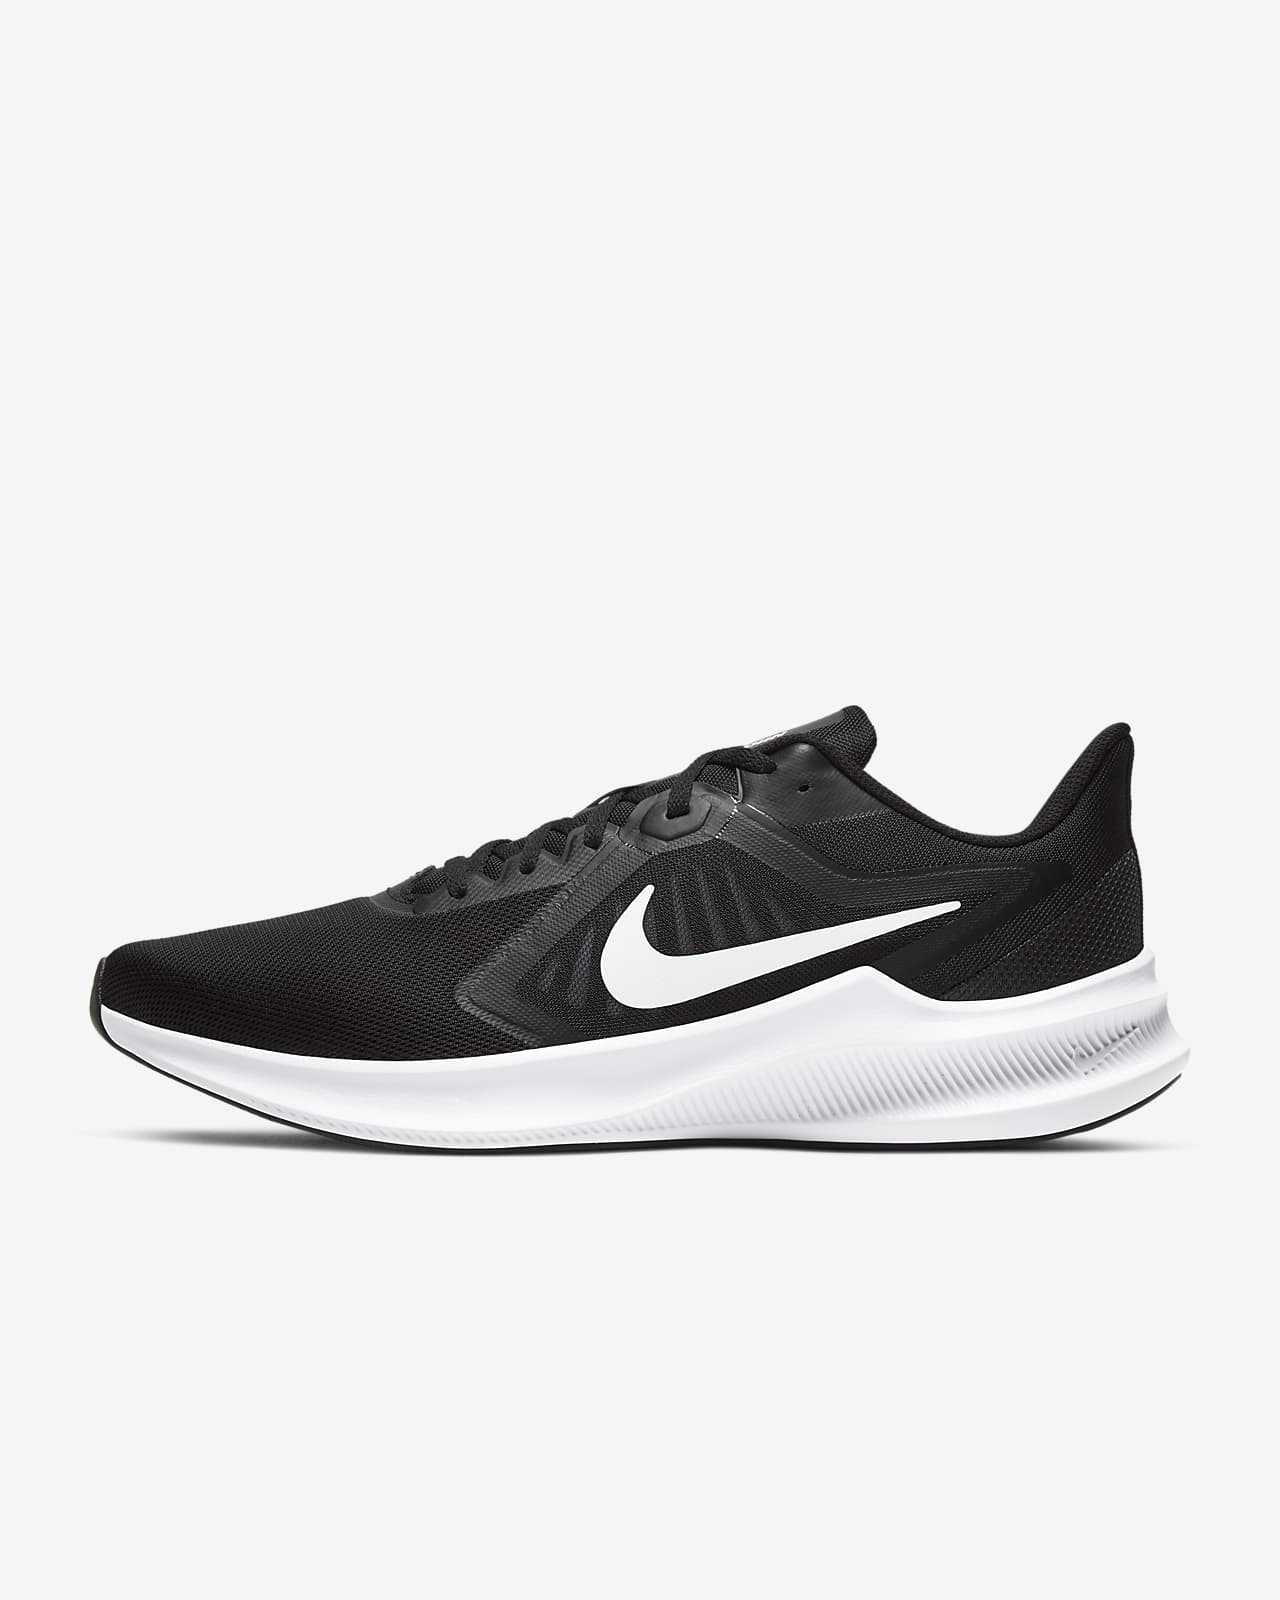 Calzado de running para carretera para hombre Nike Downshifter 10